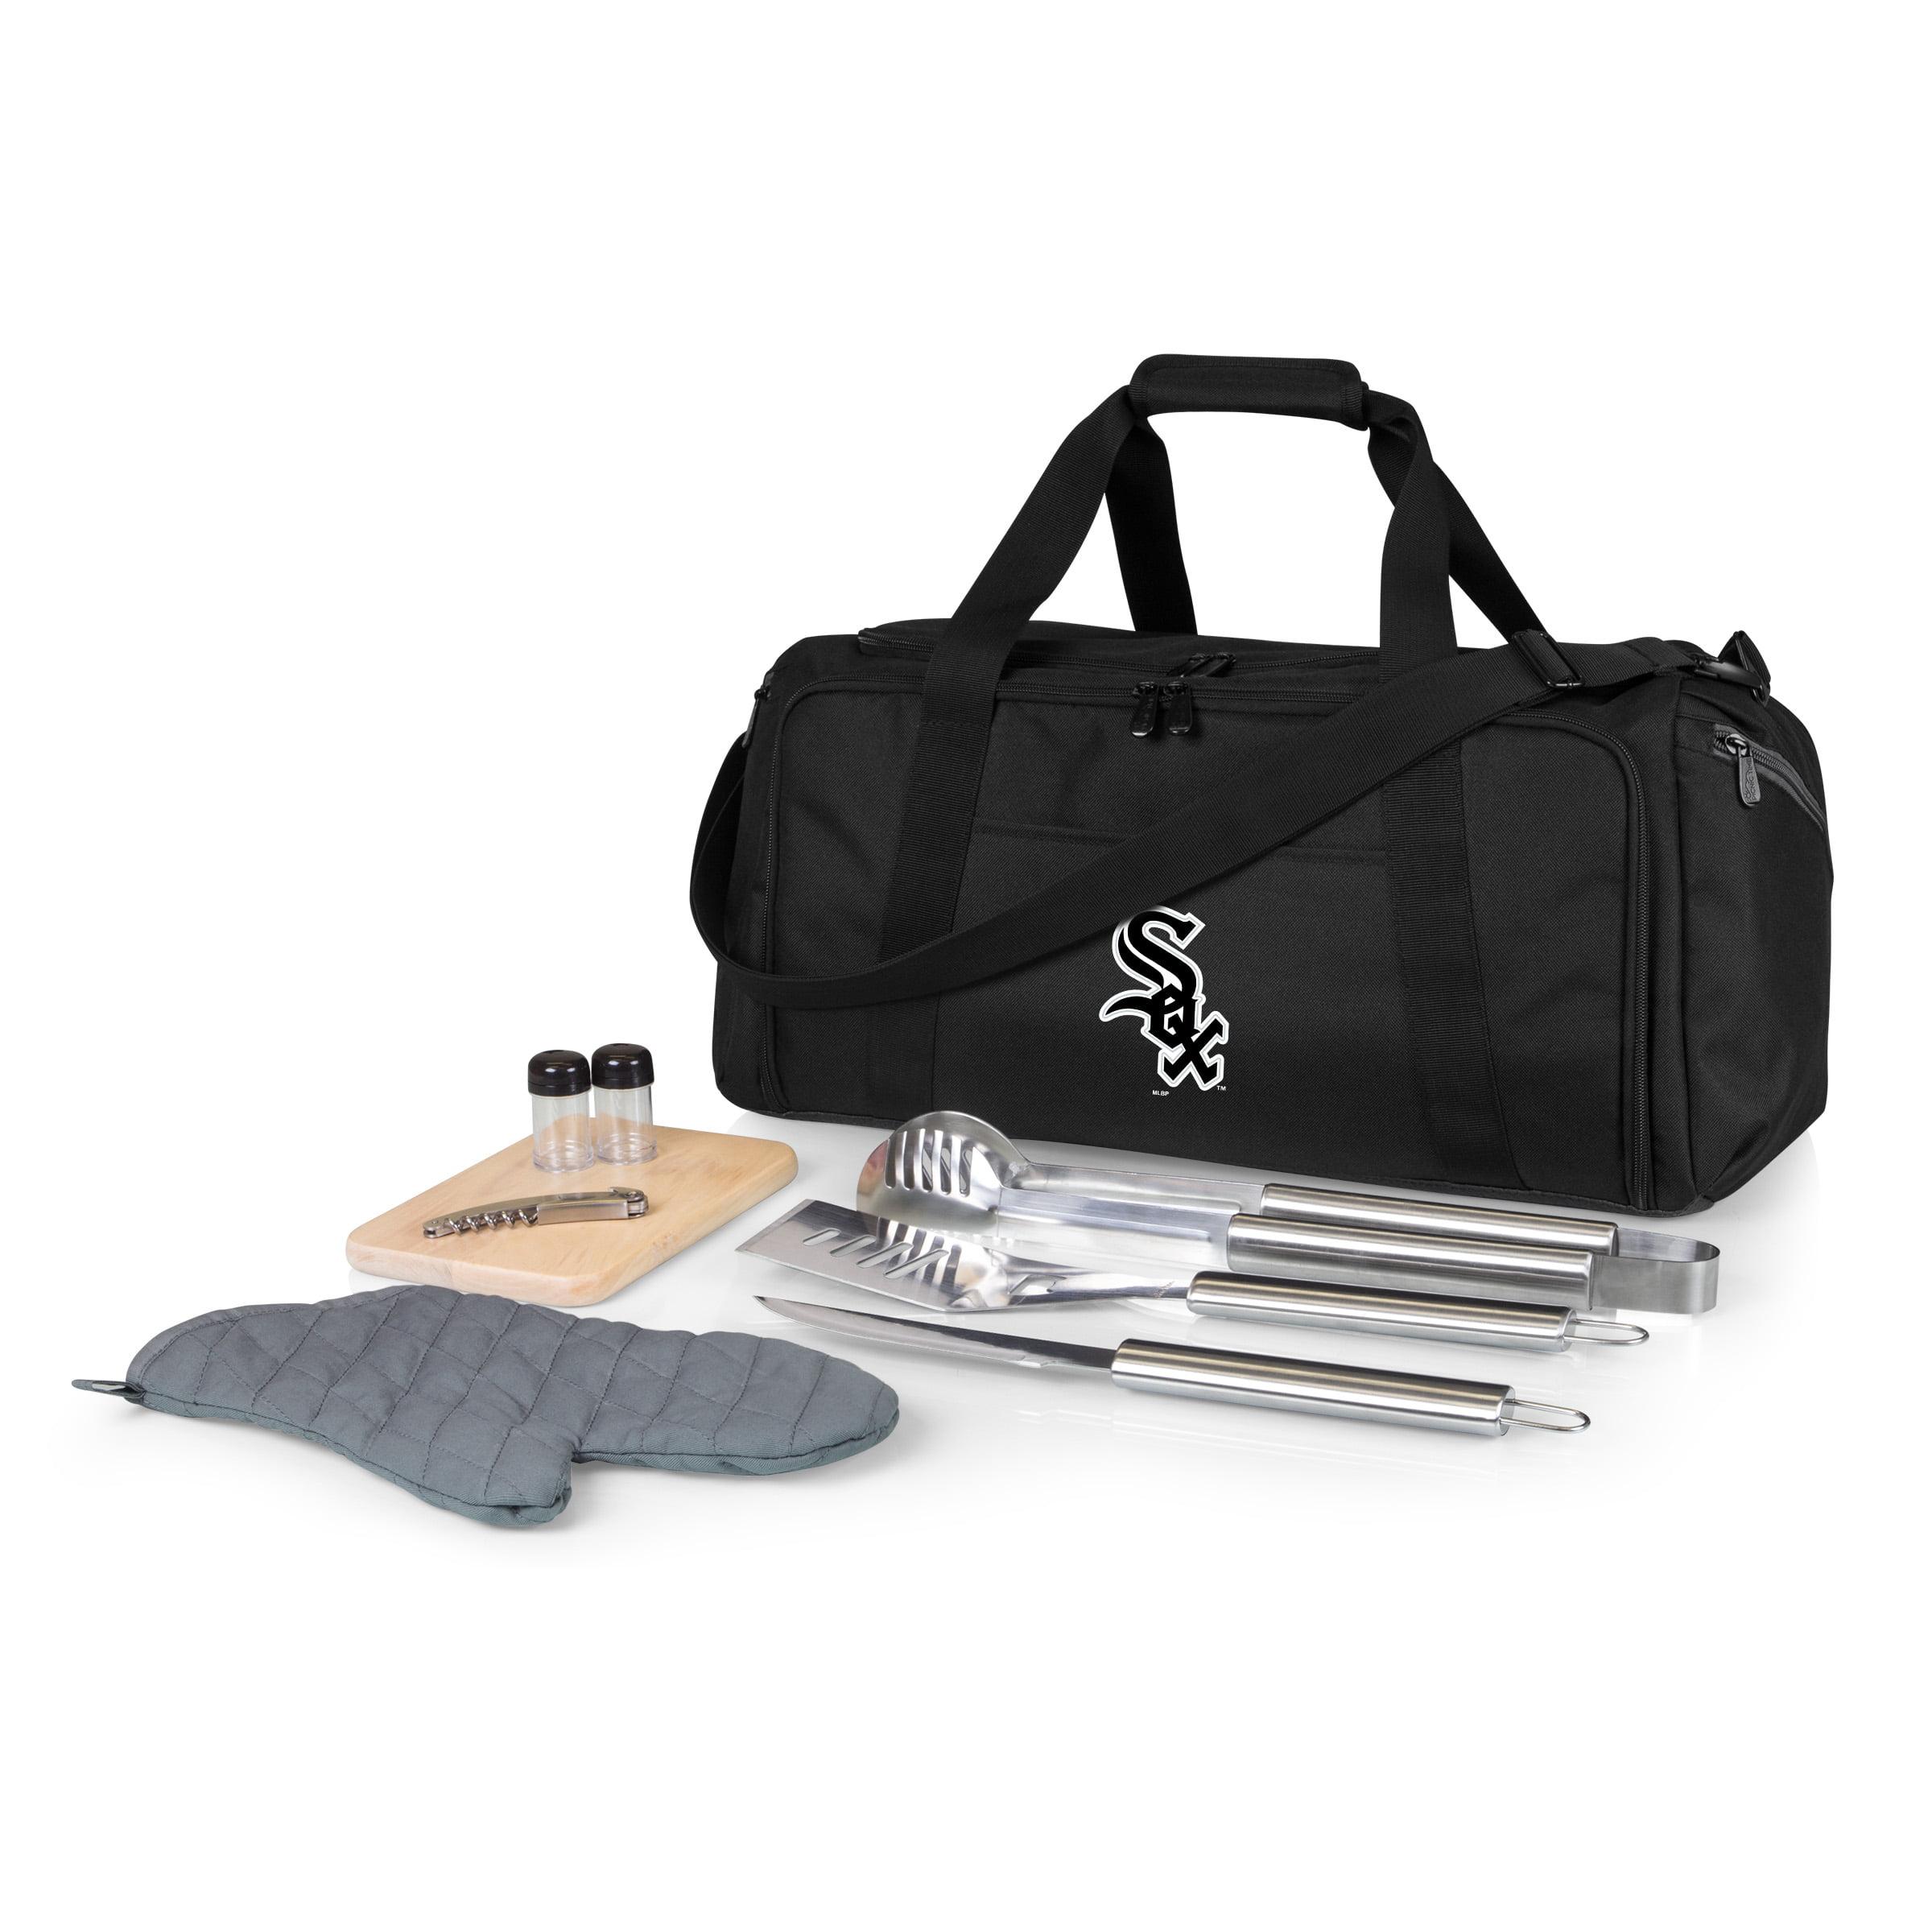 Chicago White Sox BBQ Kit Cooler - Black - No Size